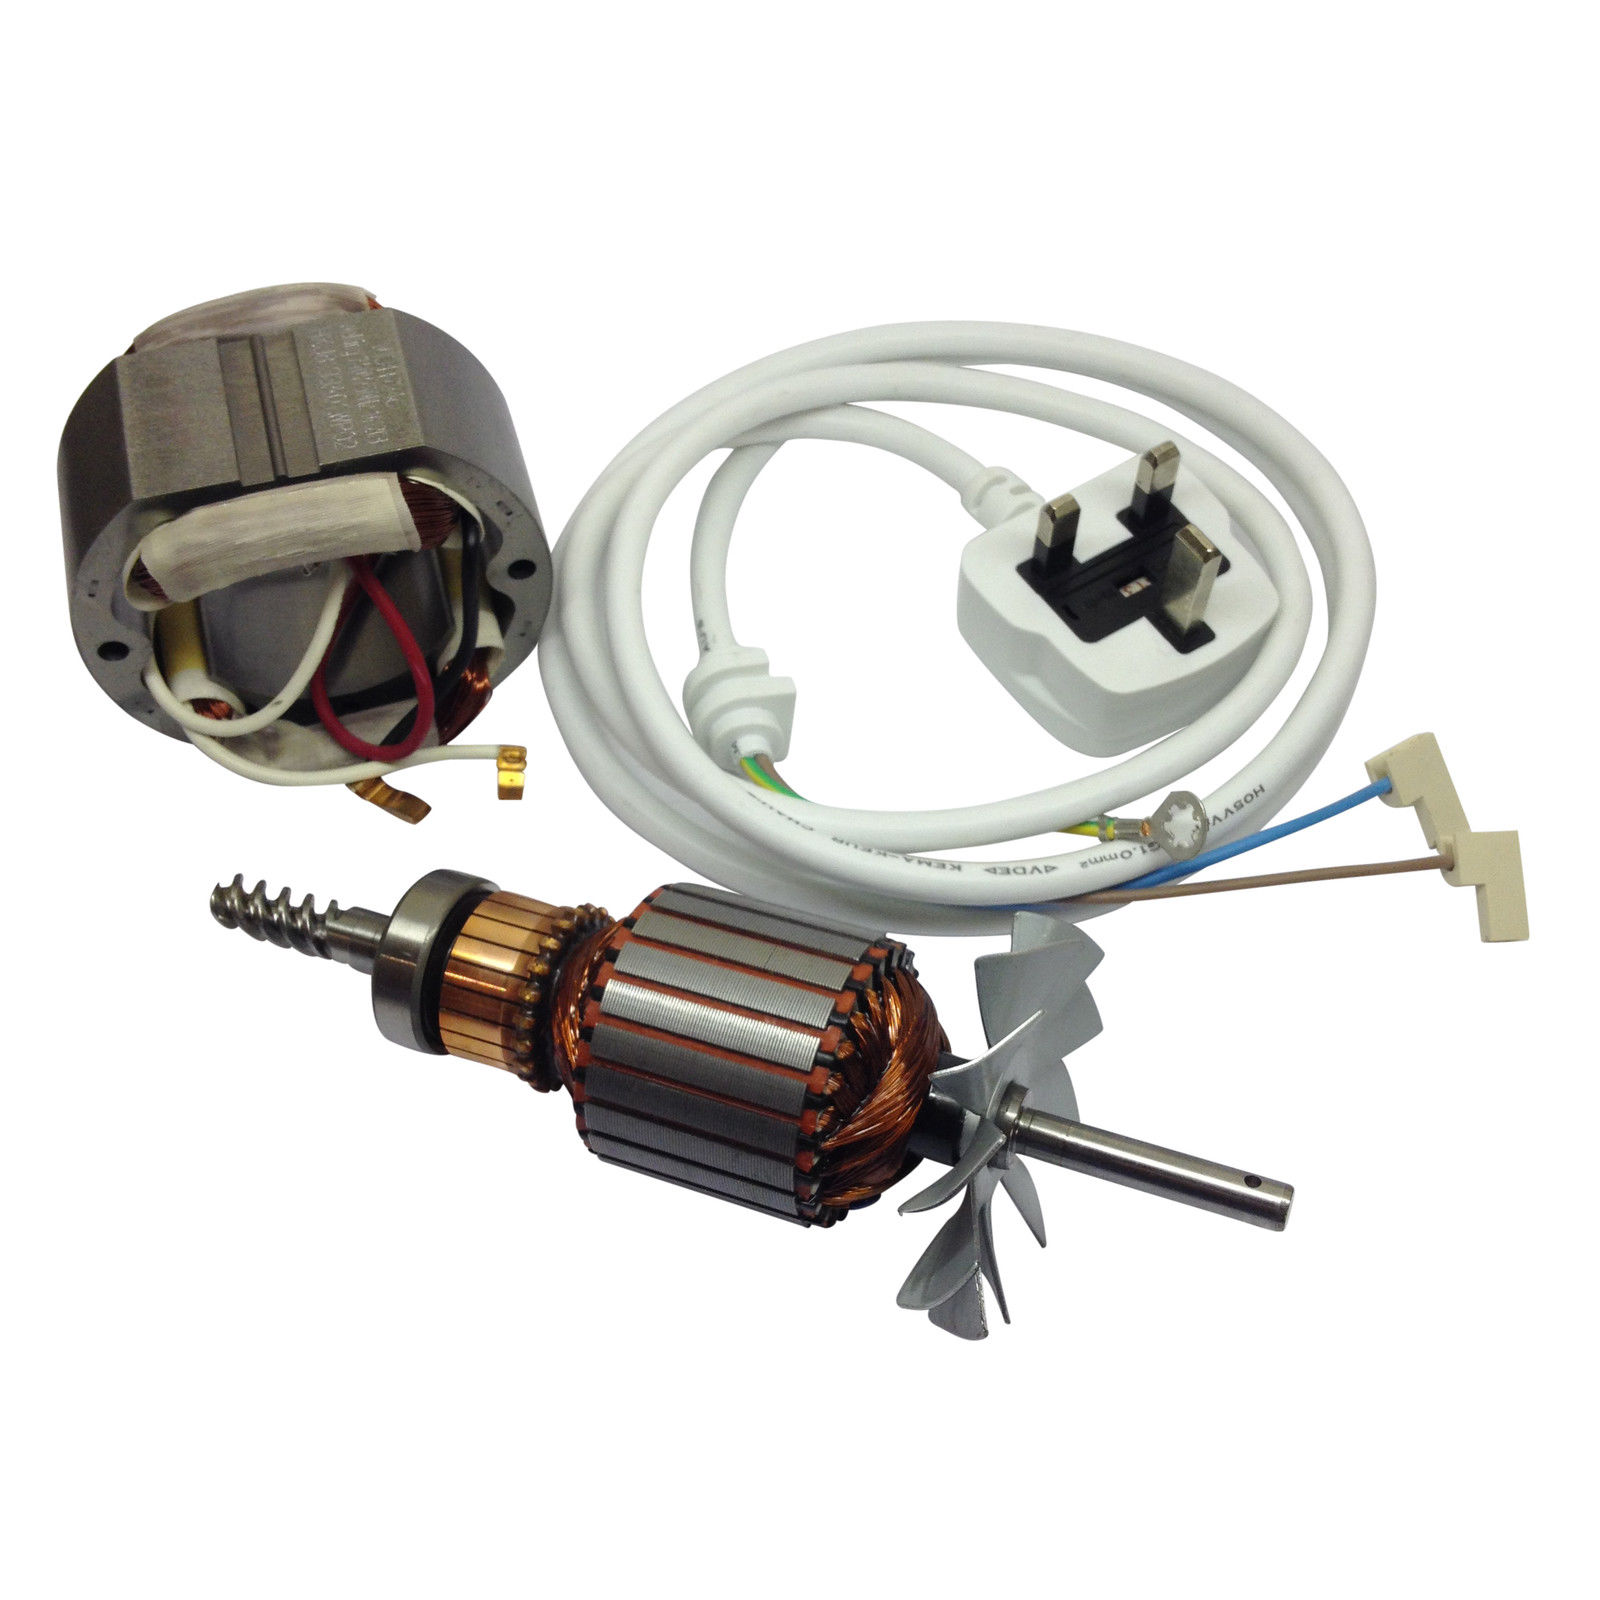 Kitchenaid artisan mixer armature field coil power cable 220 240v lana 39 s kenwood - Kitchenaid artisan stand mixer parts ...